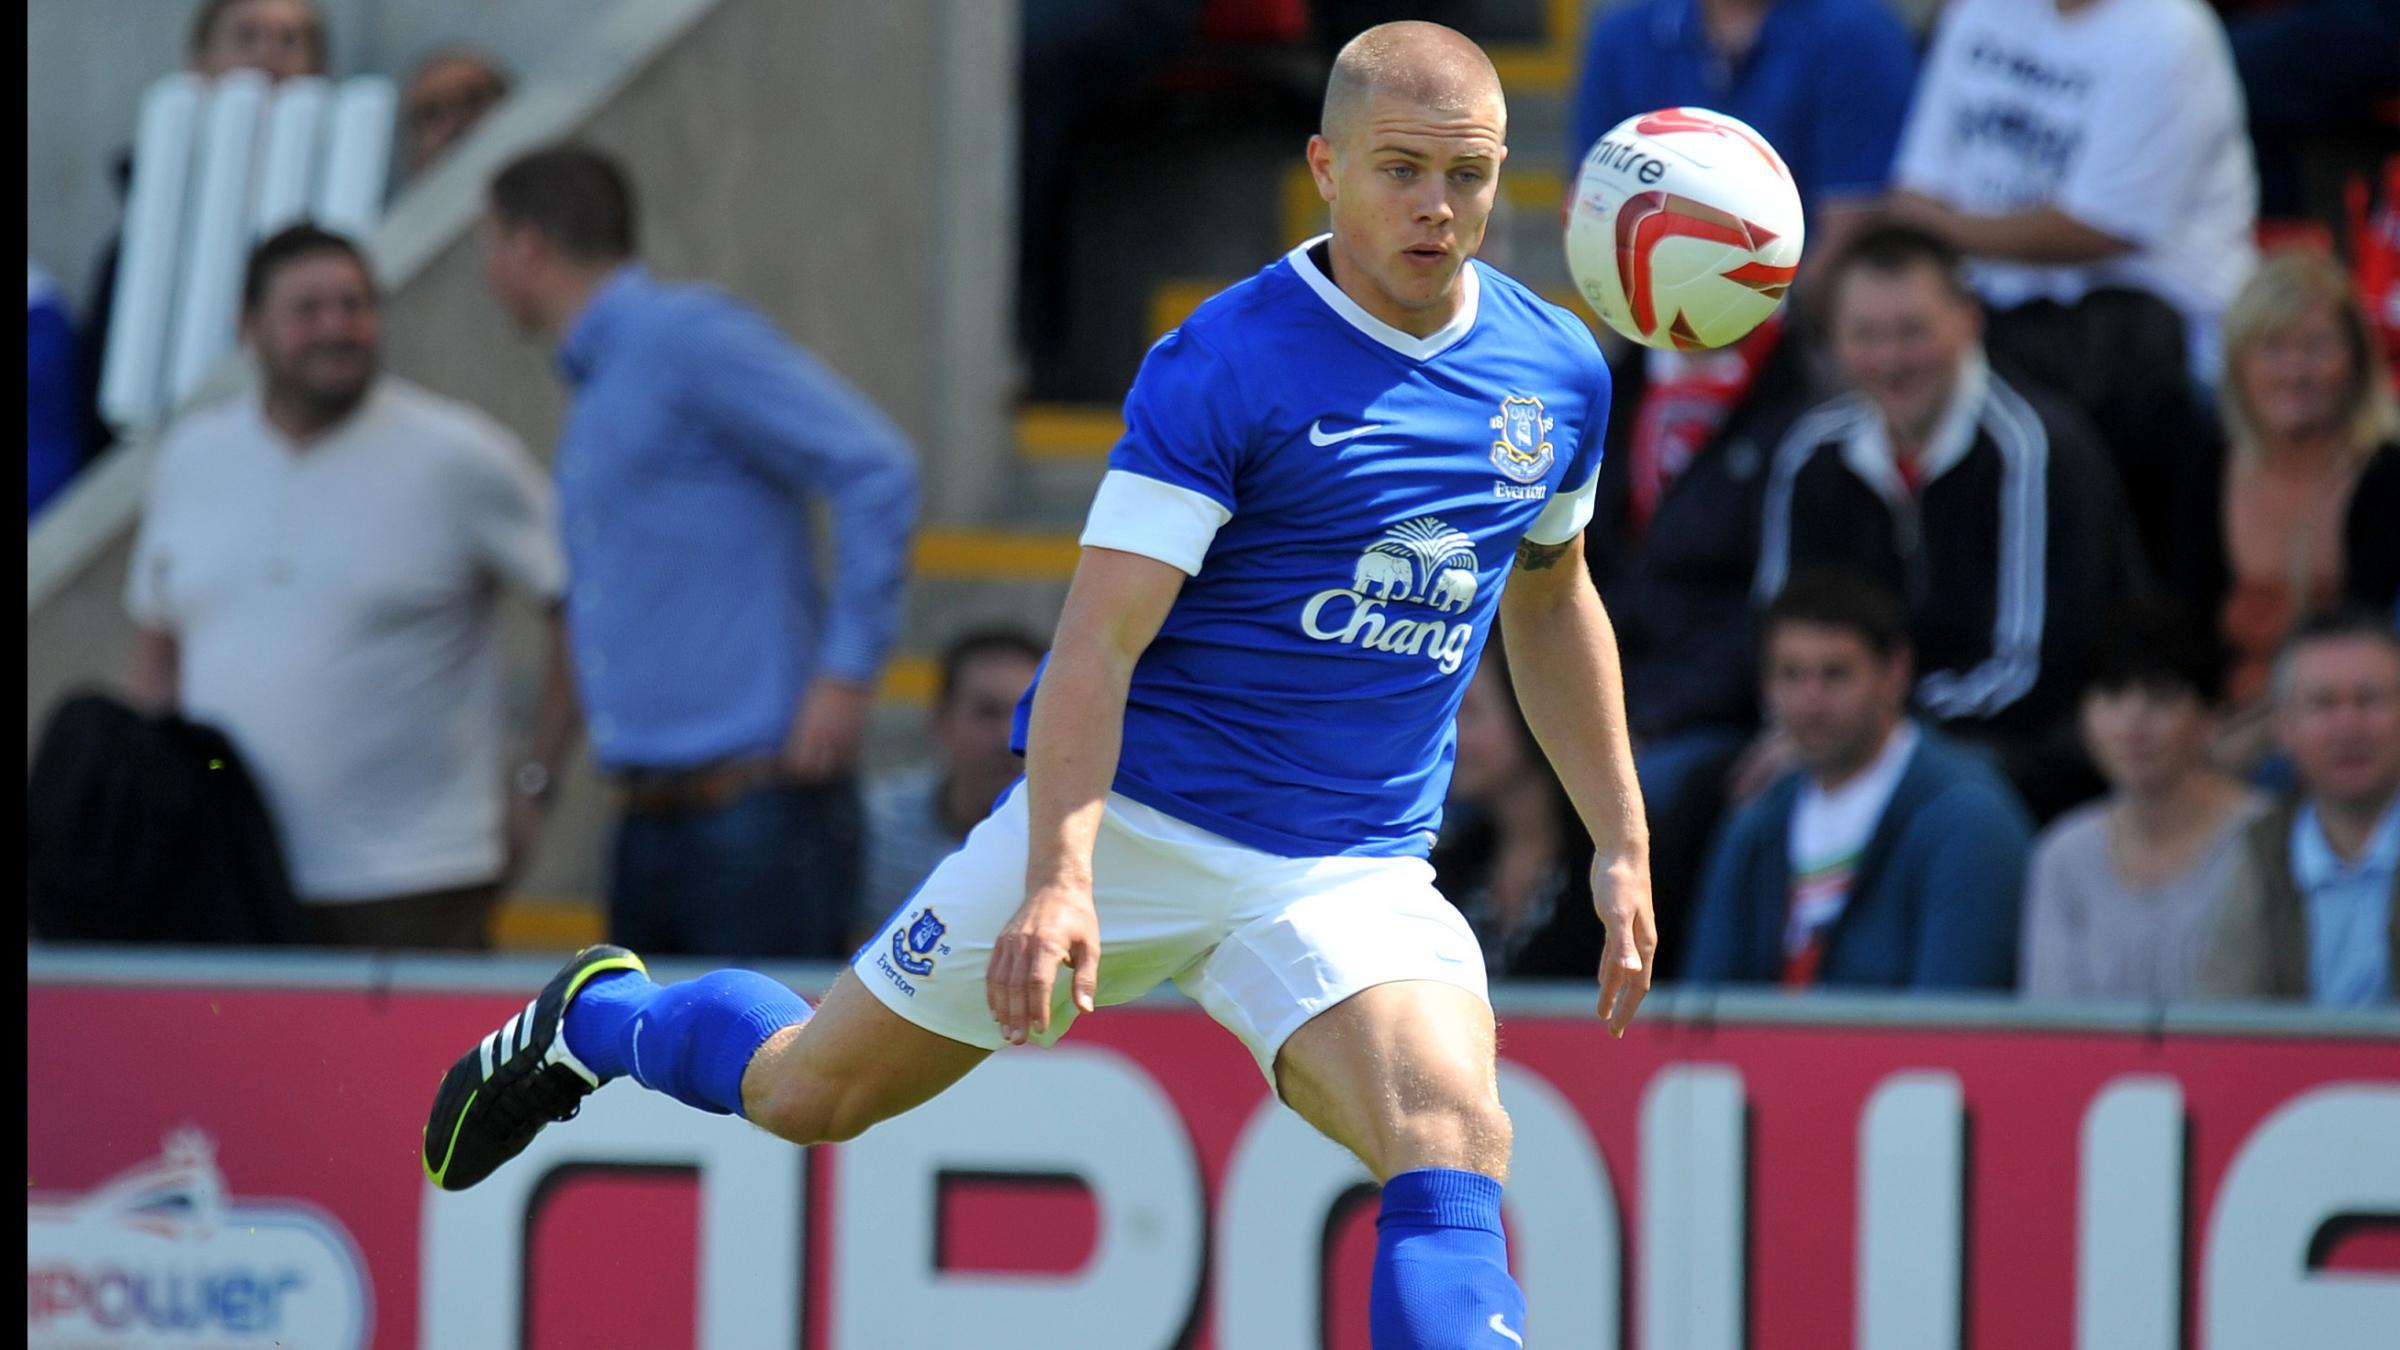 Bidwell at Everton